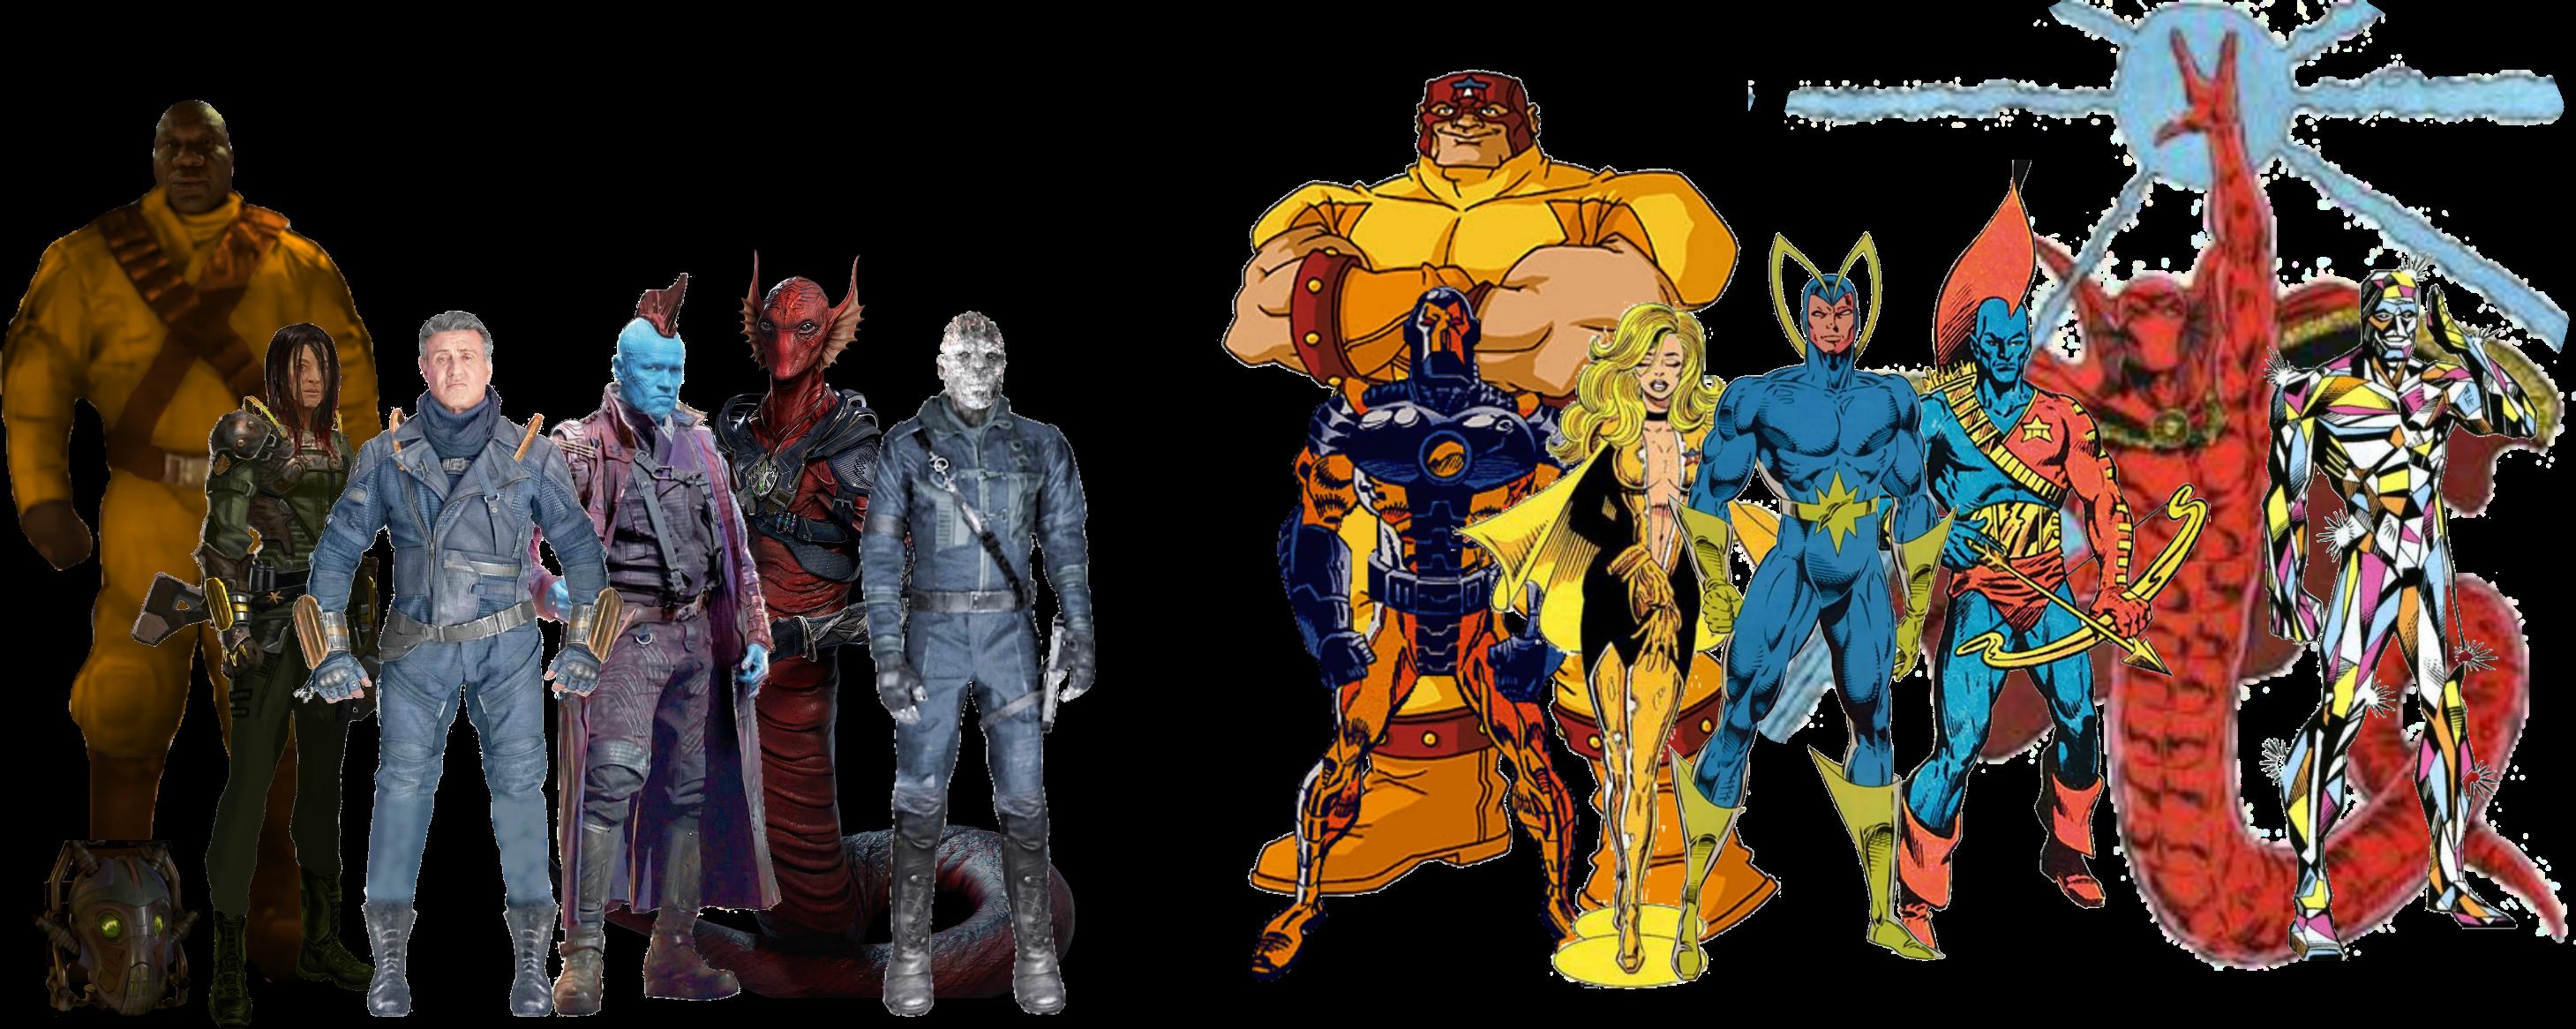 Marvel Classic Guardians Of The Galaxy Movie Comic By Davidbksandrade On Deviantart